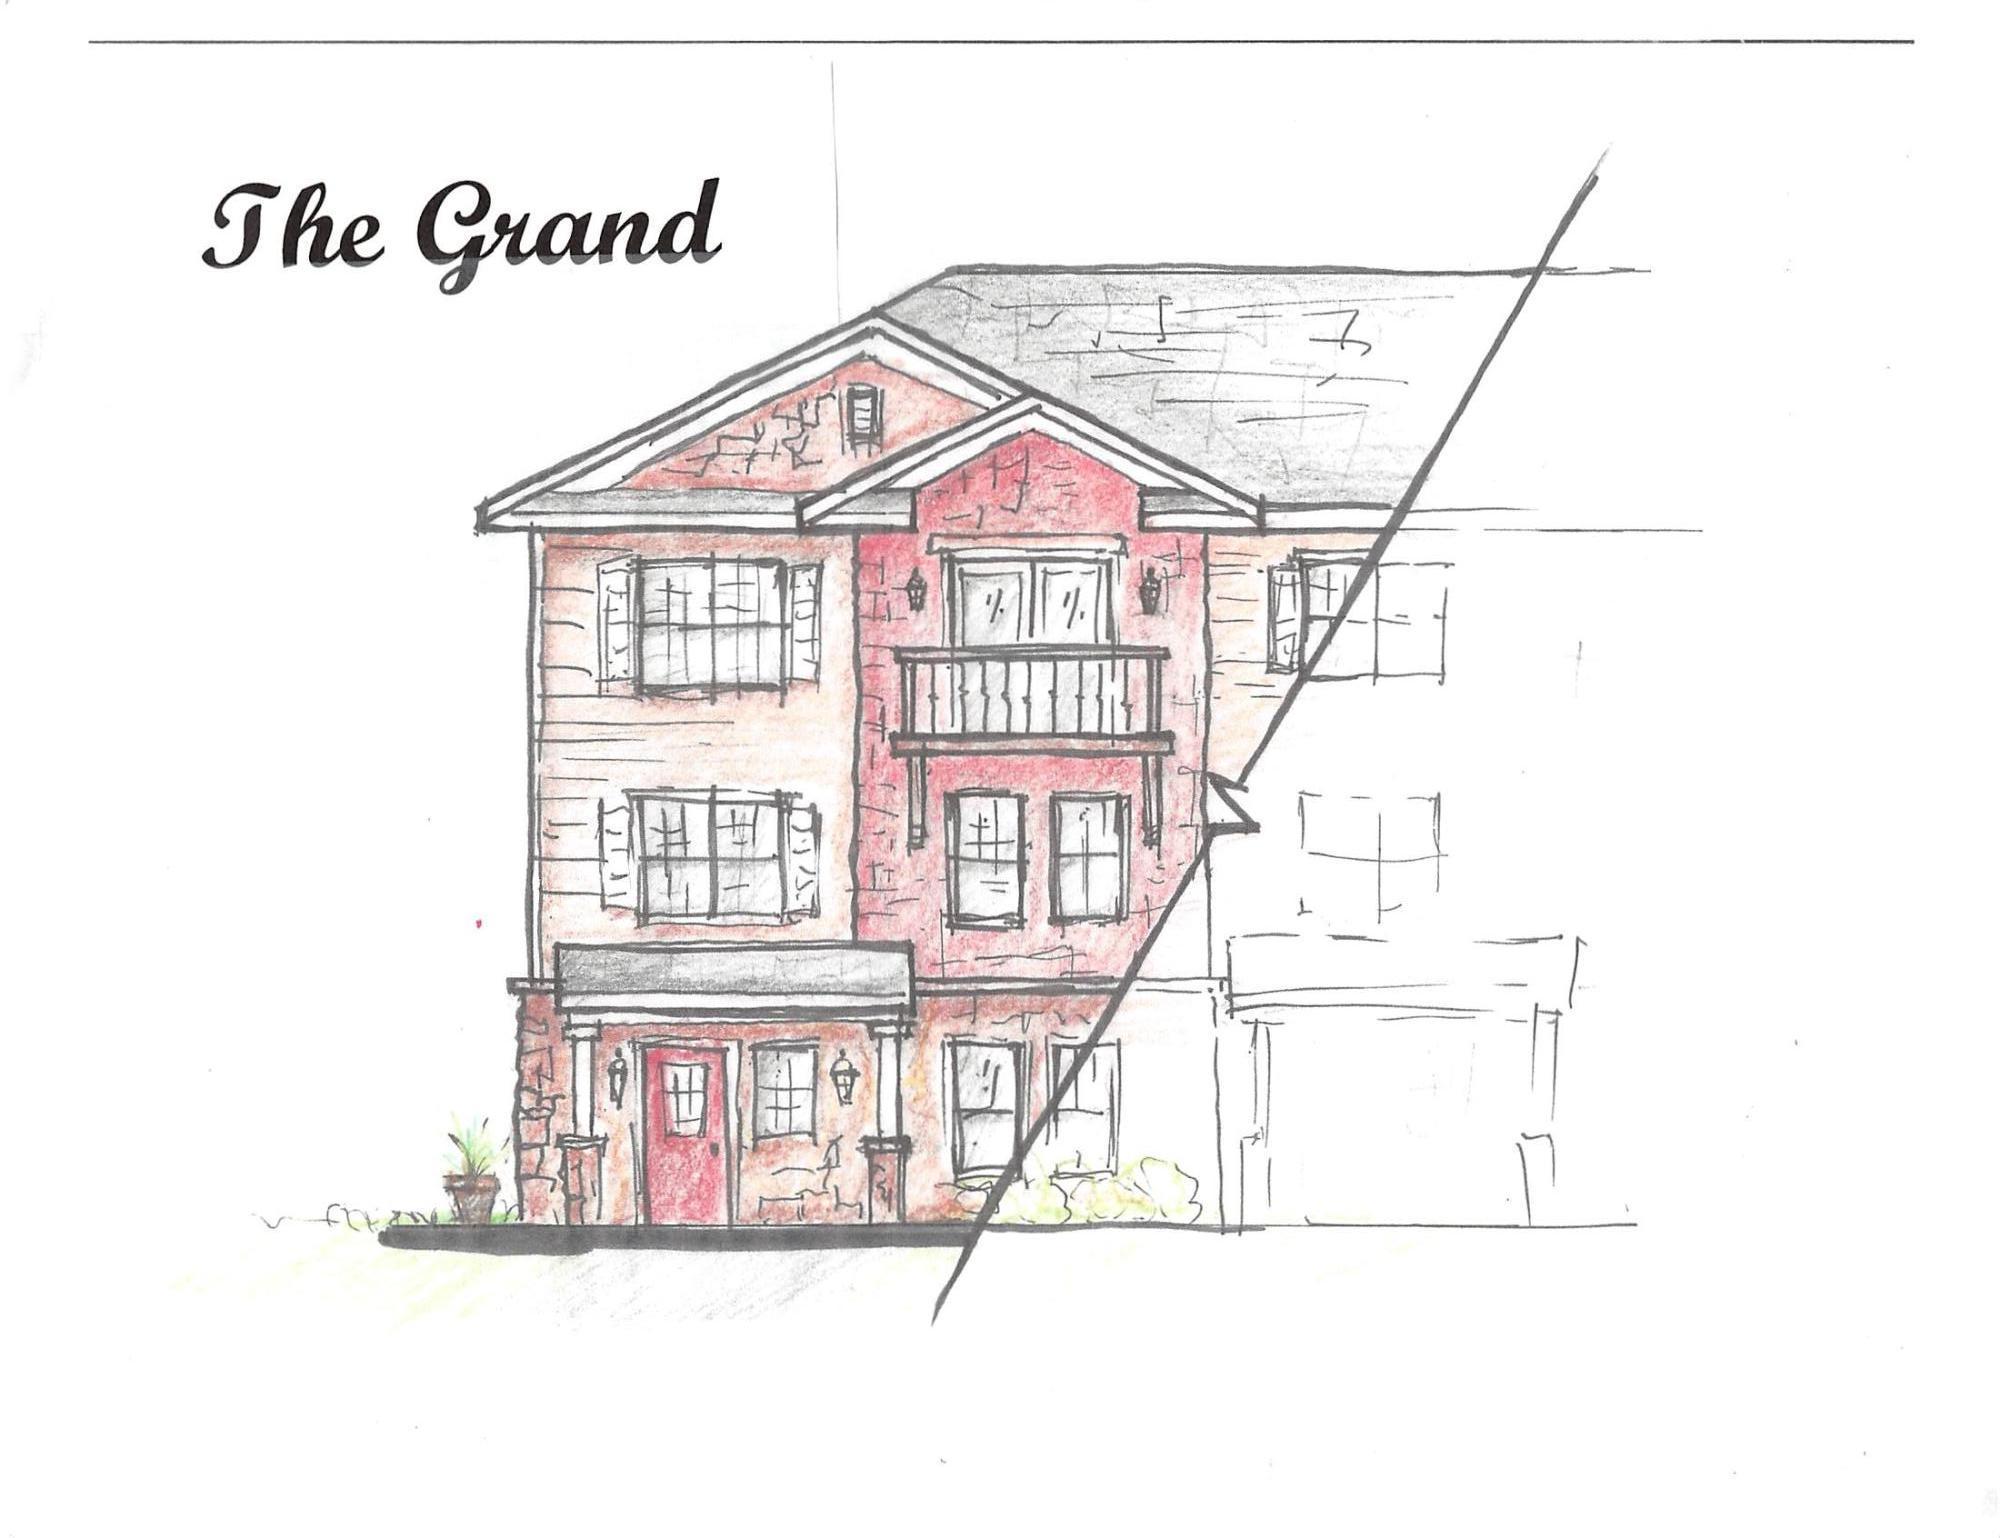 204 Grand Ave, Mukwonago, Wisconsin 53149, 2 Bedrooms Bedrooms, ,2 BathroomsBathrooms,Condominiums,For Sale,Grand Ave,1,1695813